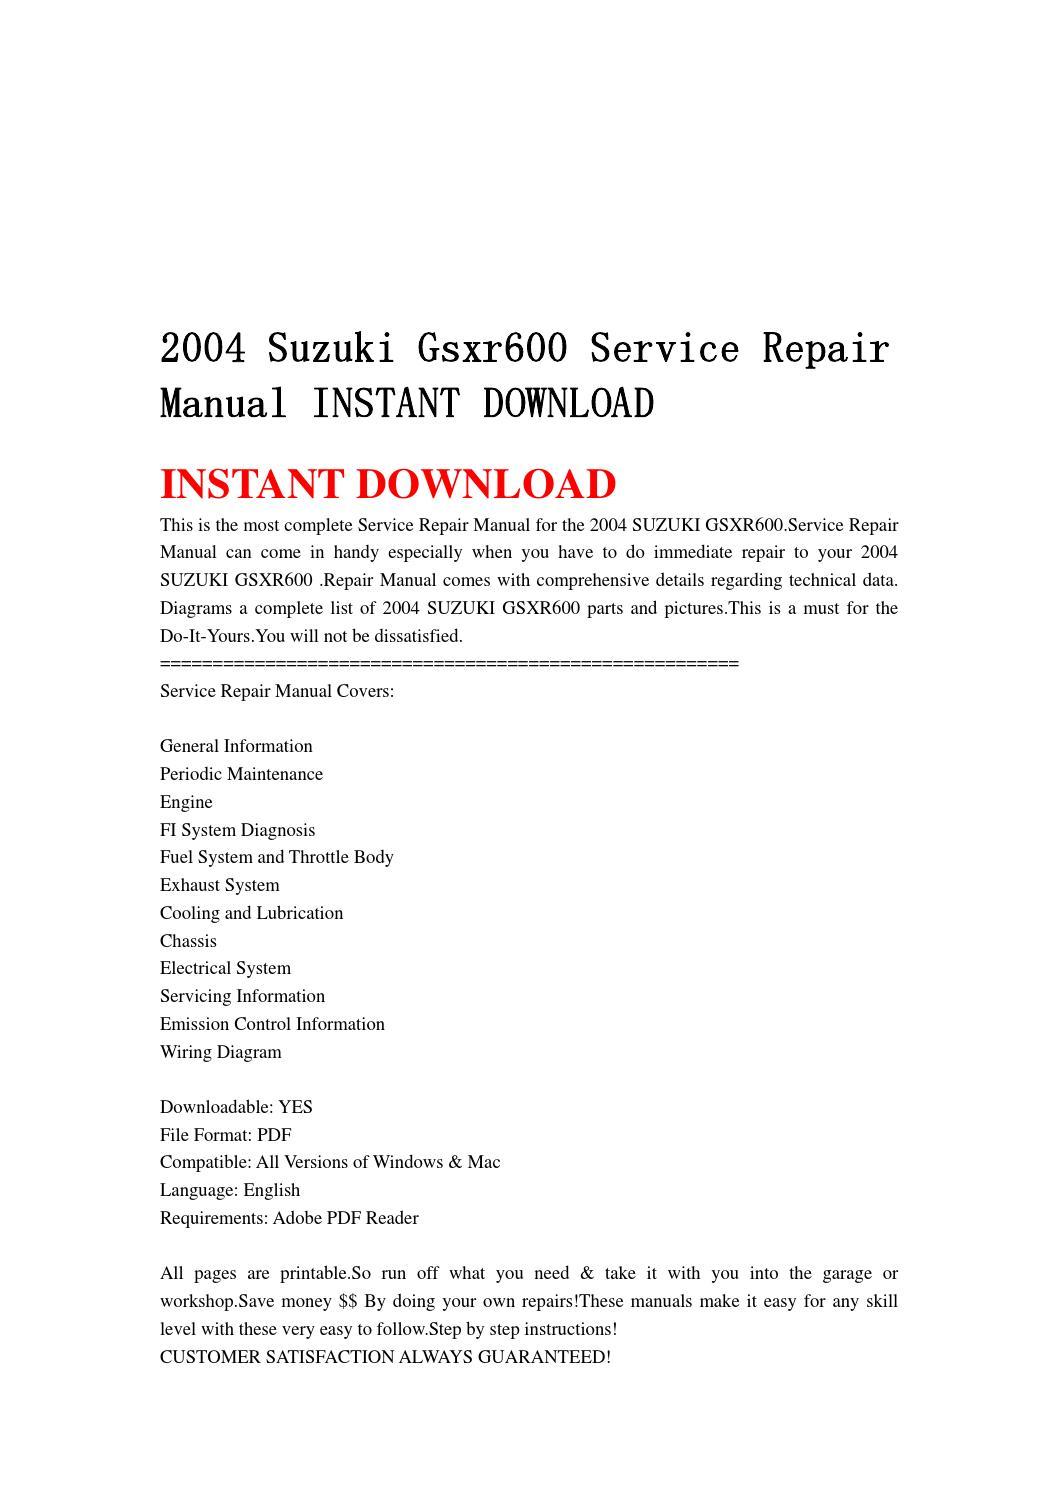 2004 suzuki gsxr600 service repair manual instant download by sjefsebjn -  issuu